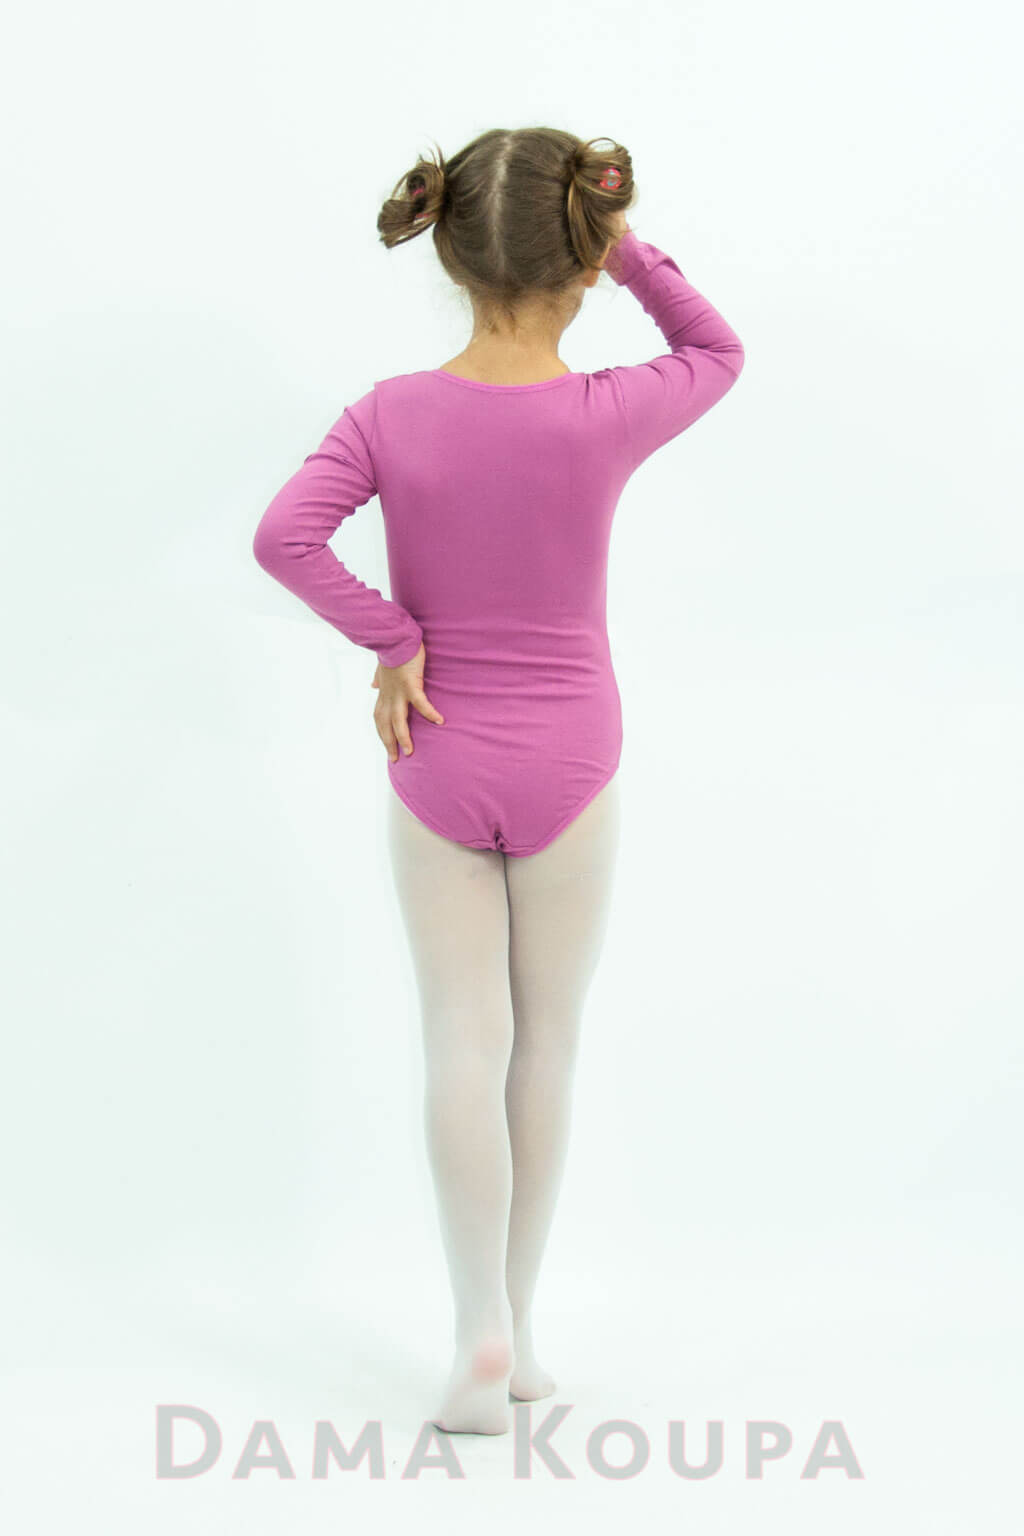 de8185fddef Παιδικό κορμάκι χορού σε ροζ χρώμα Παιδικό κορμάκι μπαλέτου με μακρύ μανίκι